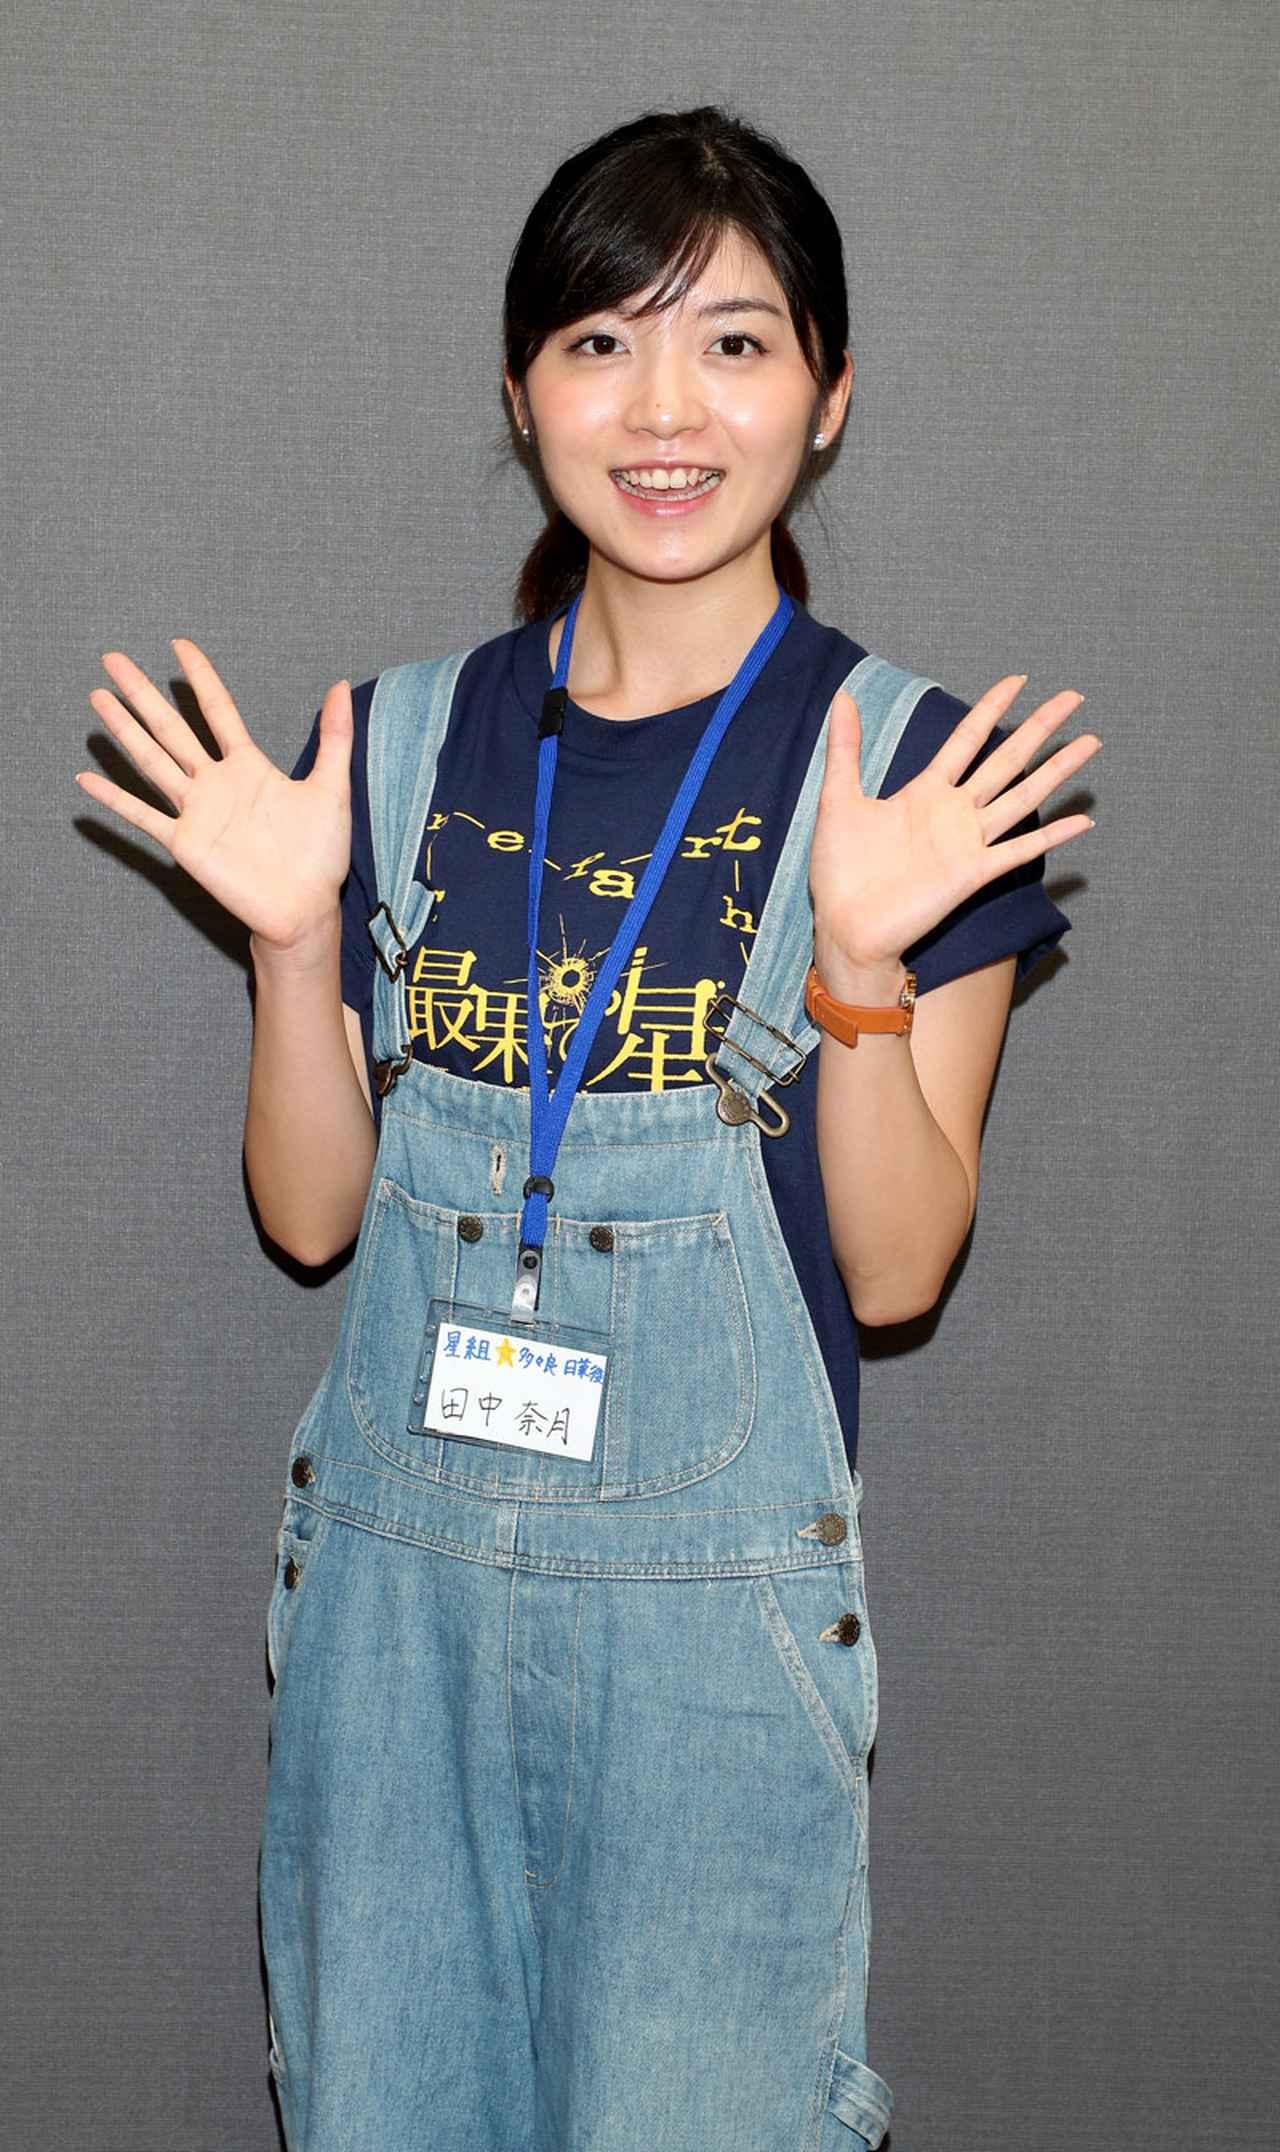 Images : 3番目の画像 - 「田中奈月/将来有望な若手女優の中でも大注目の一人が、アリスインプロジェクト最新作で印象に残る役を熱演!」のアルバム - Stereo Sound ONLINE